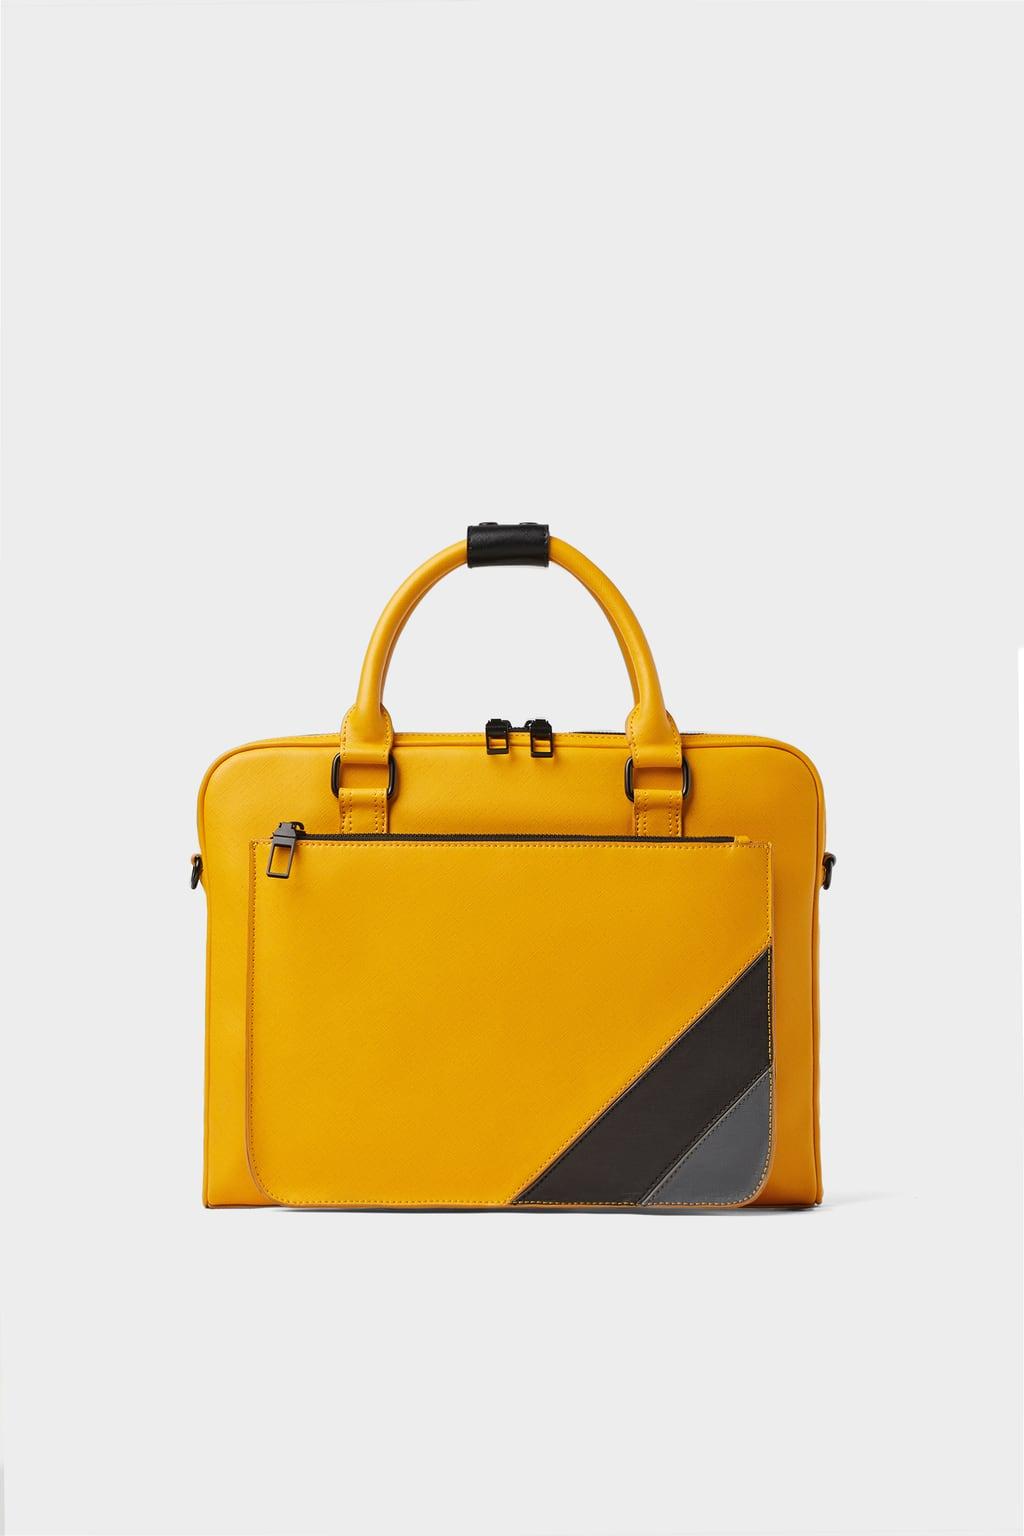 Zara Yellow Contrast Briefcase